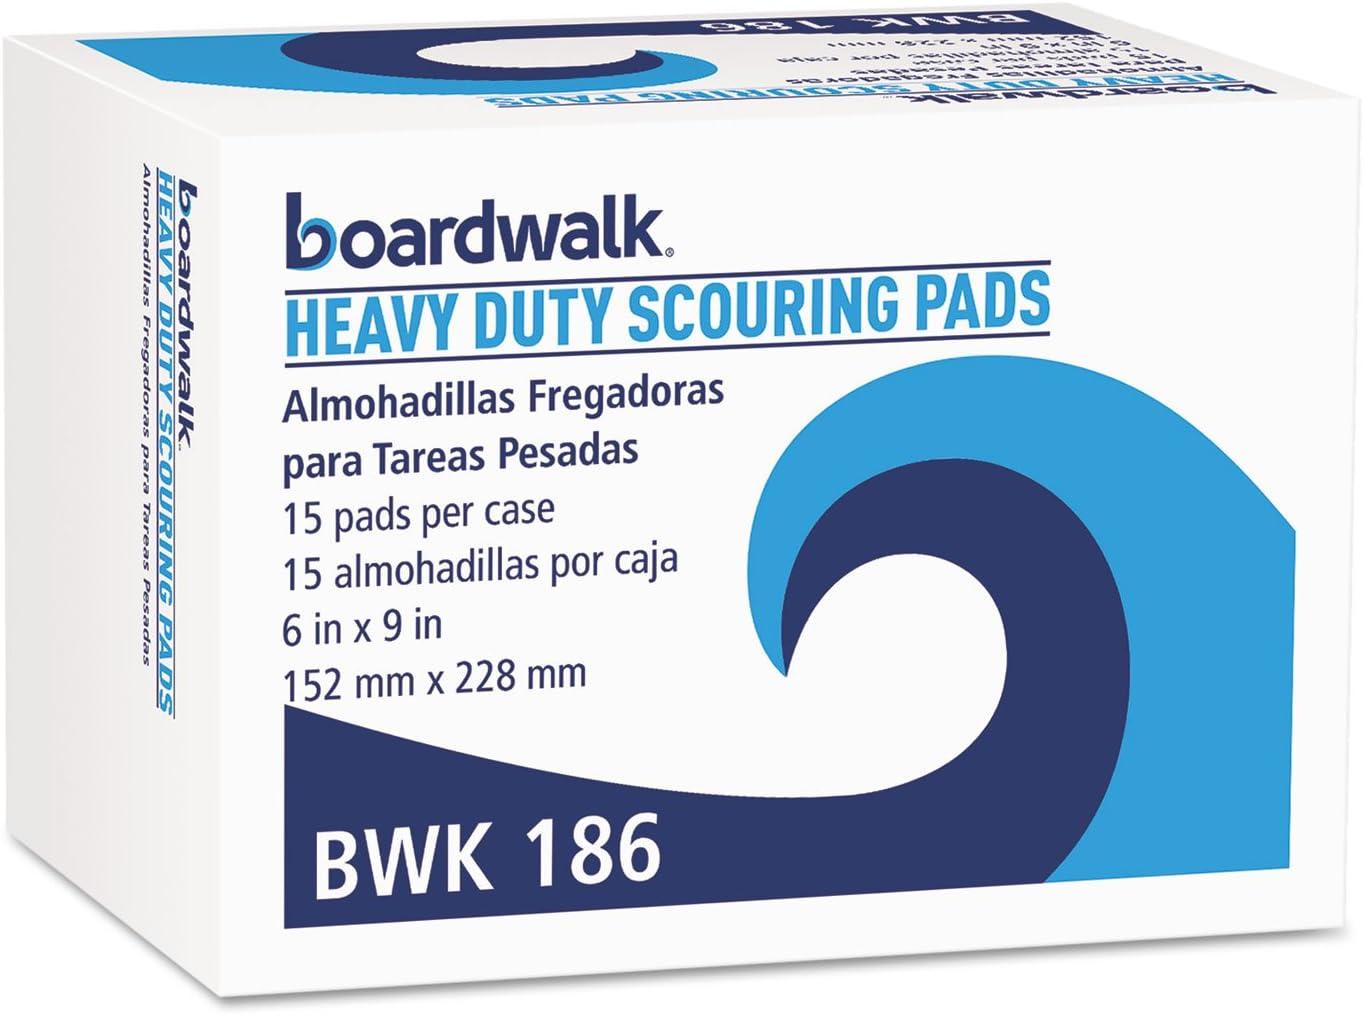 Boardwalk Heavy-Duty Scour Pad Green 6 54913 Popular standard Max 82% OFF 9 Carton x 15